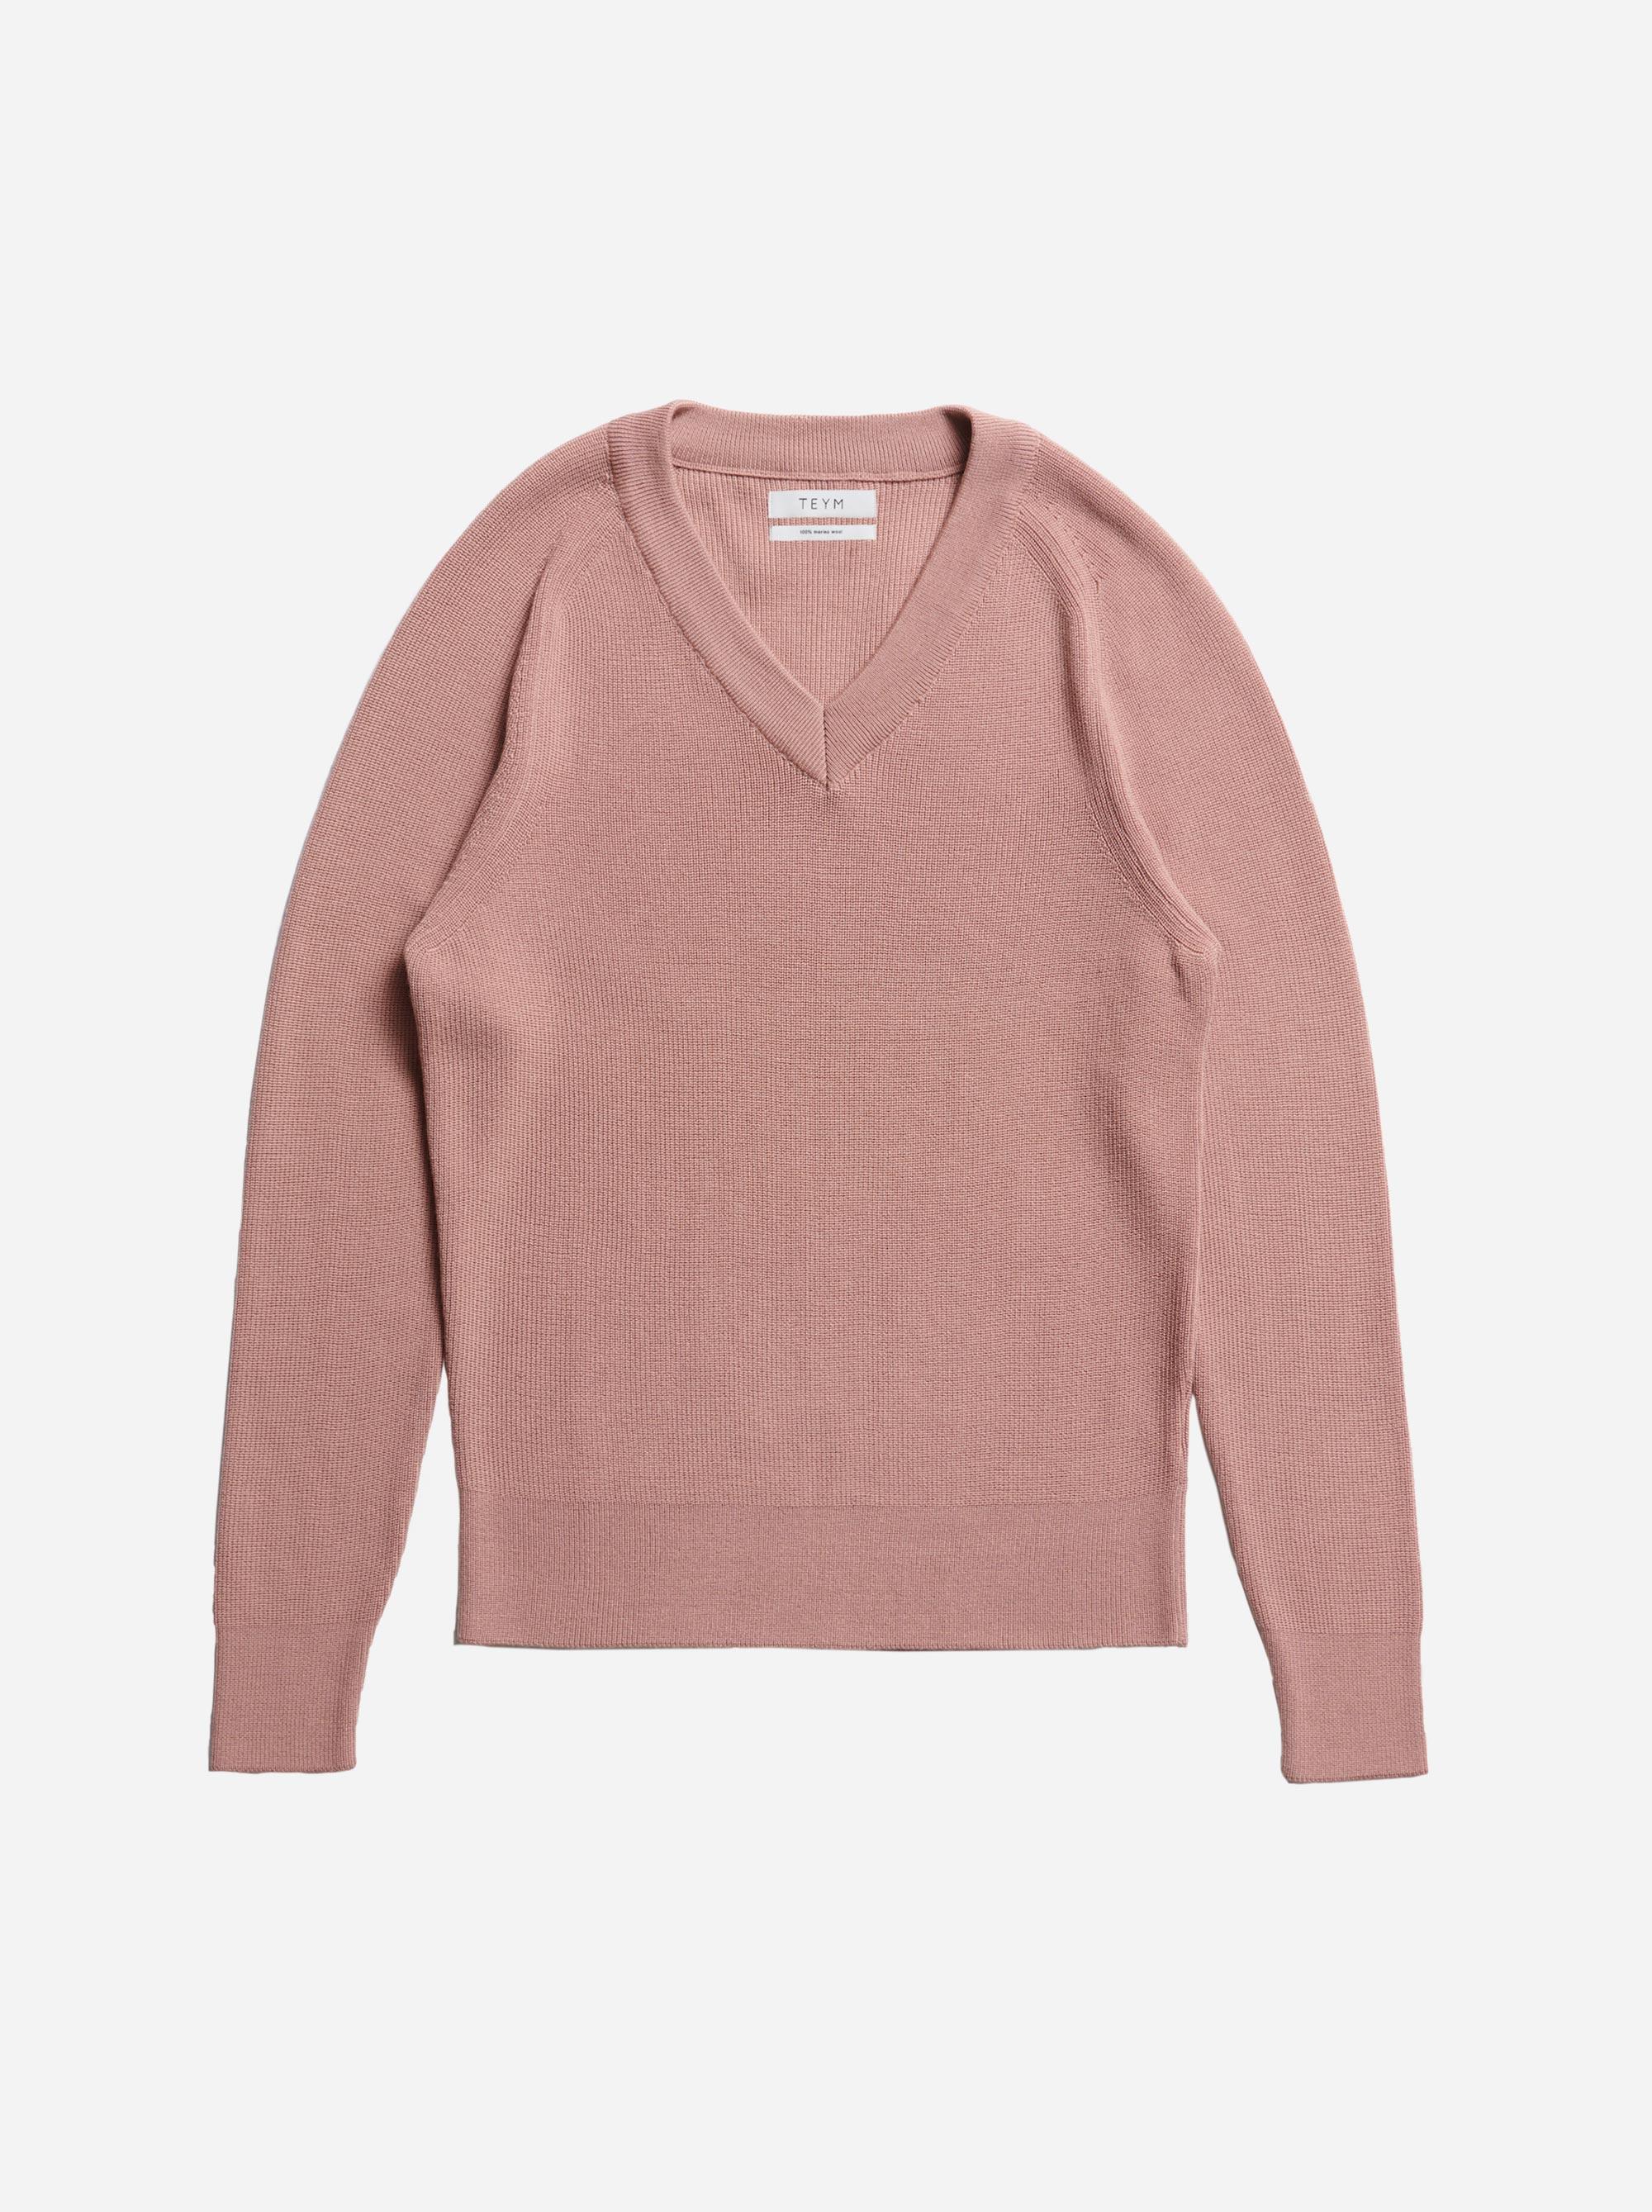 Teym - V-Neck - The Merino Sweater - Women - Pink - 4